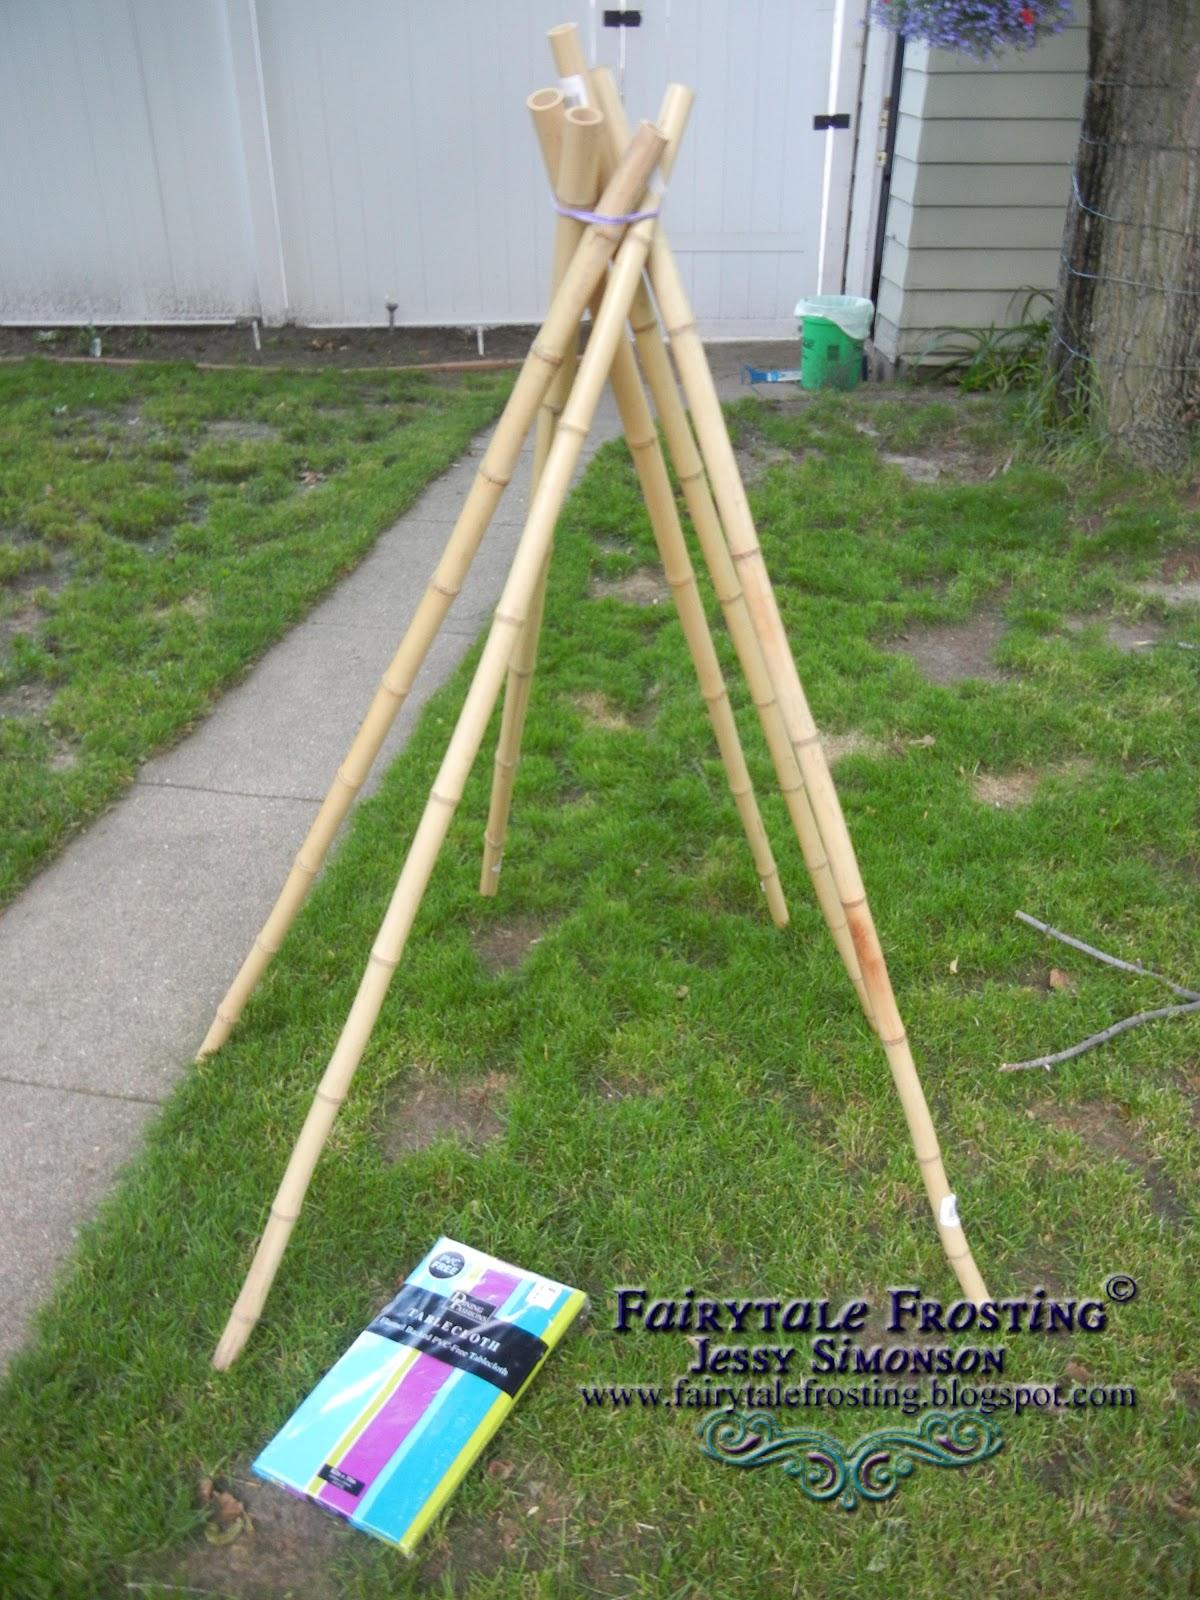 Fairytale Frosting: DIY Super Simple Backyard Teepee